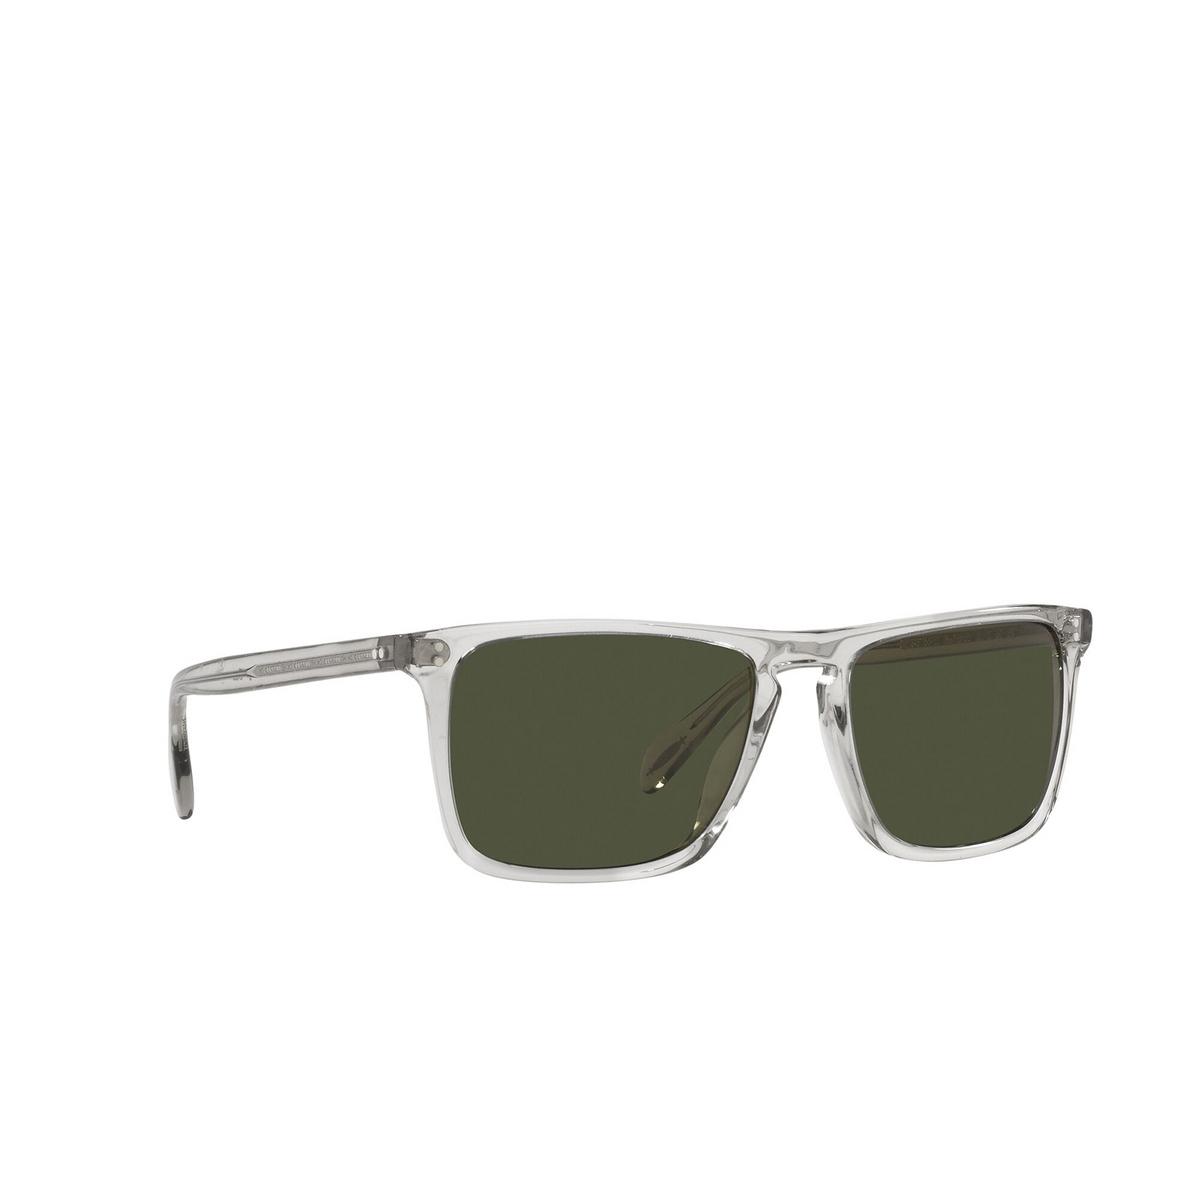 Oliver Peoples® Square Sunglasses: Bernardo OV5189S color Black Diamond 166952 - three-quarters view.